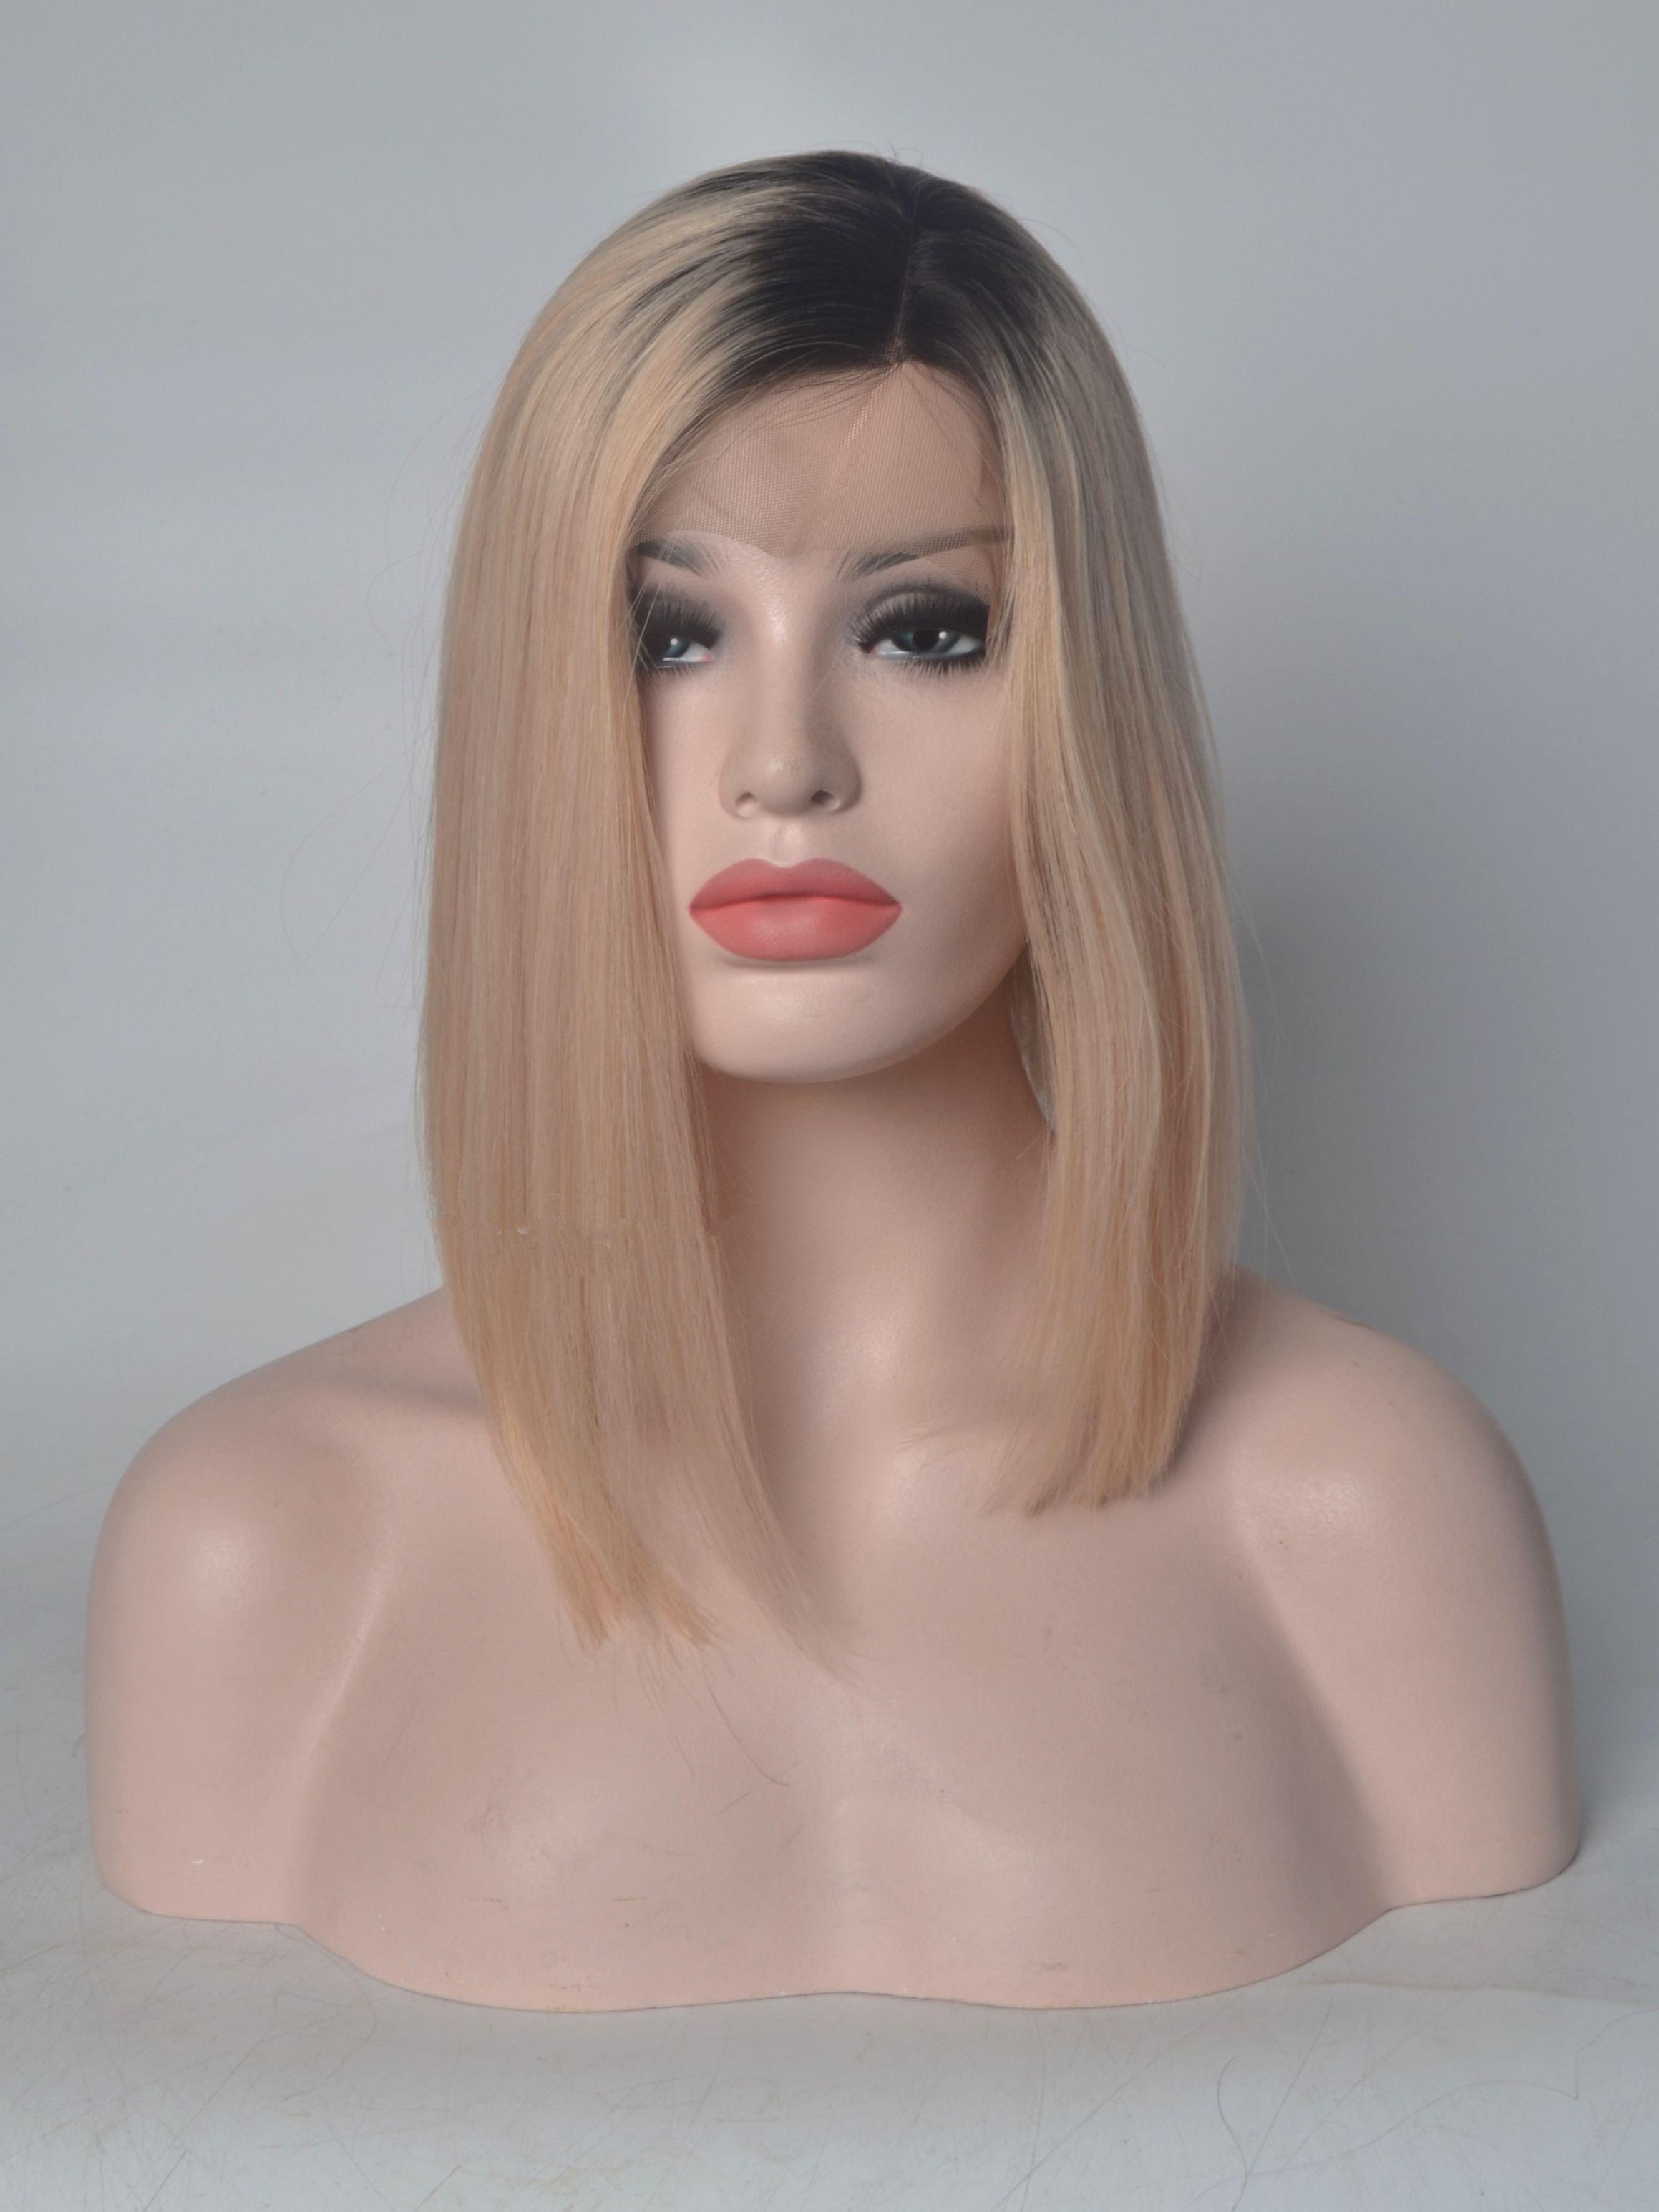 Shoulder Length Black To Blonde Human Hair Wigs VGW06020